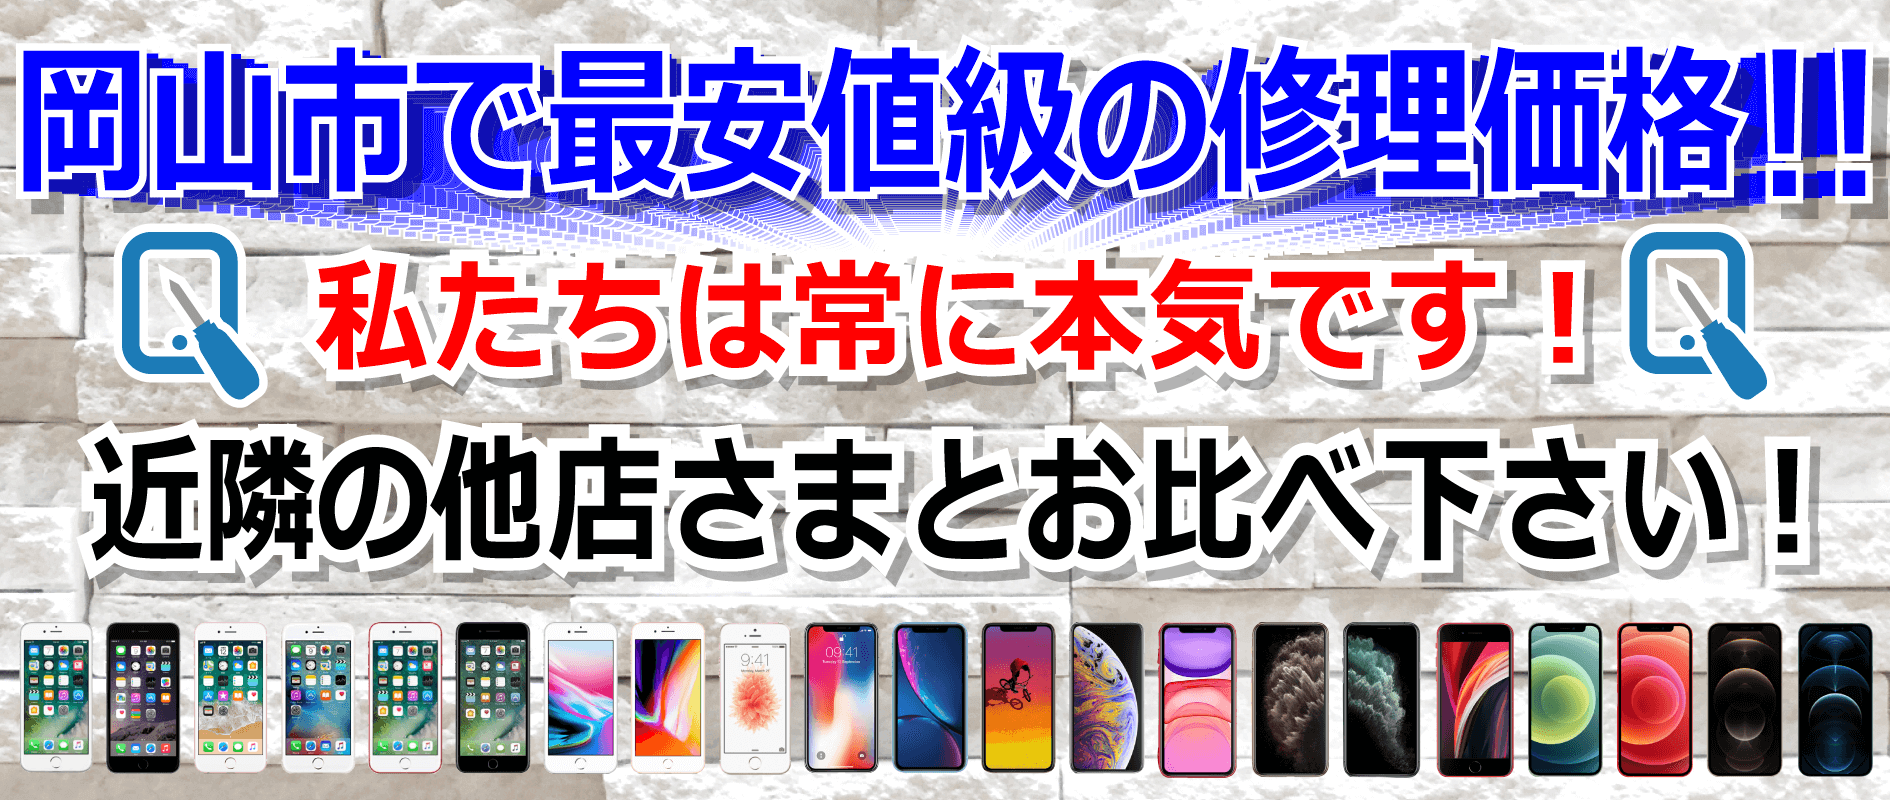 iPhone修理のクイックフィックス岡山富田店オープン